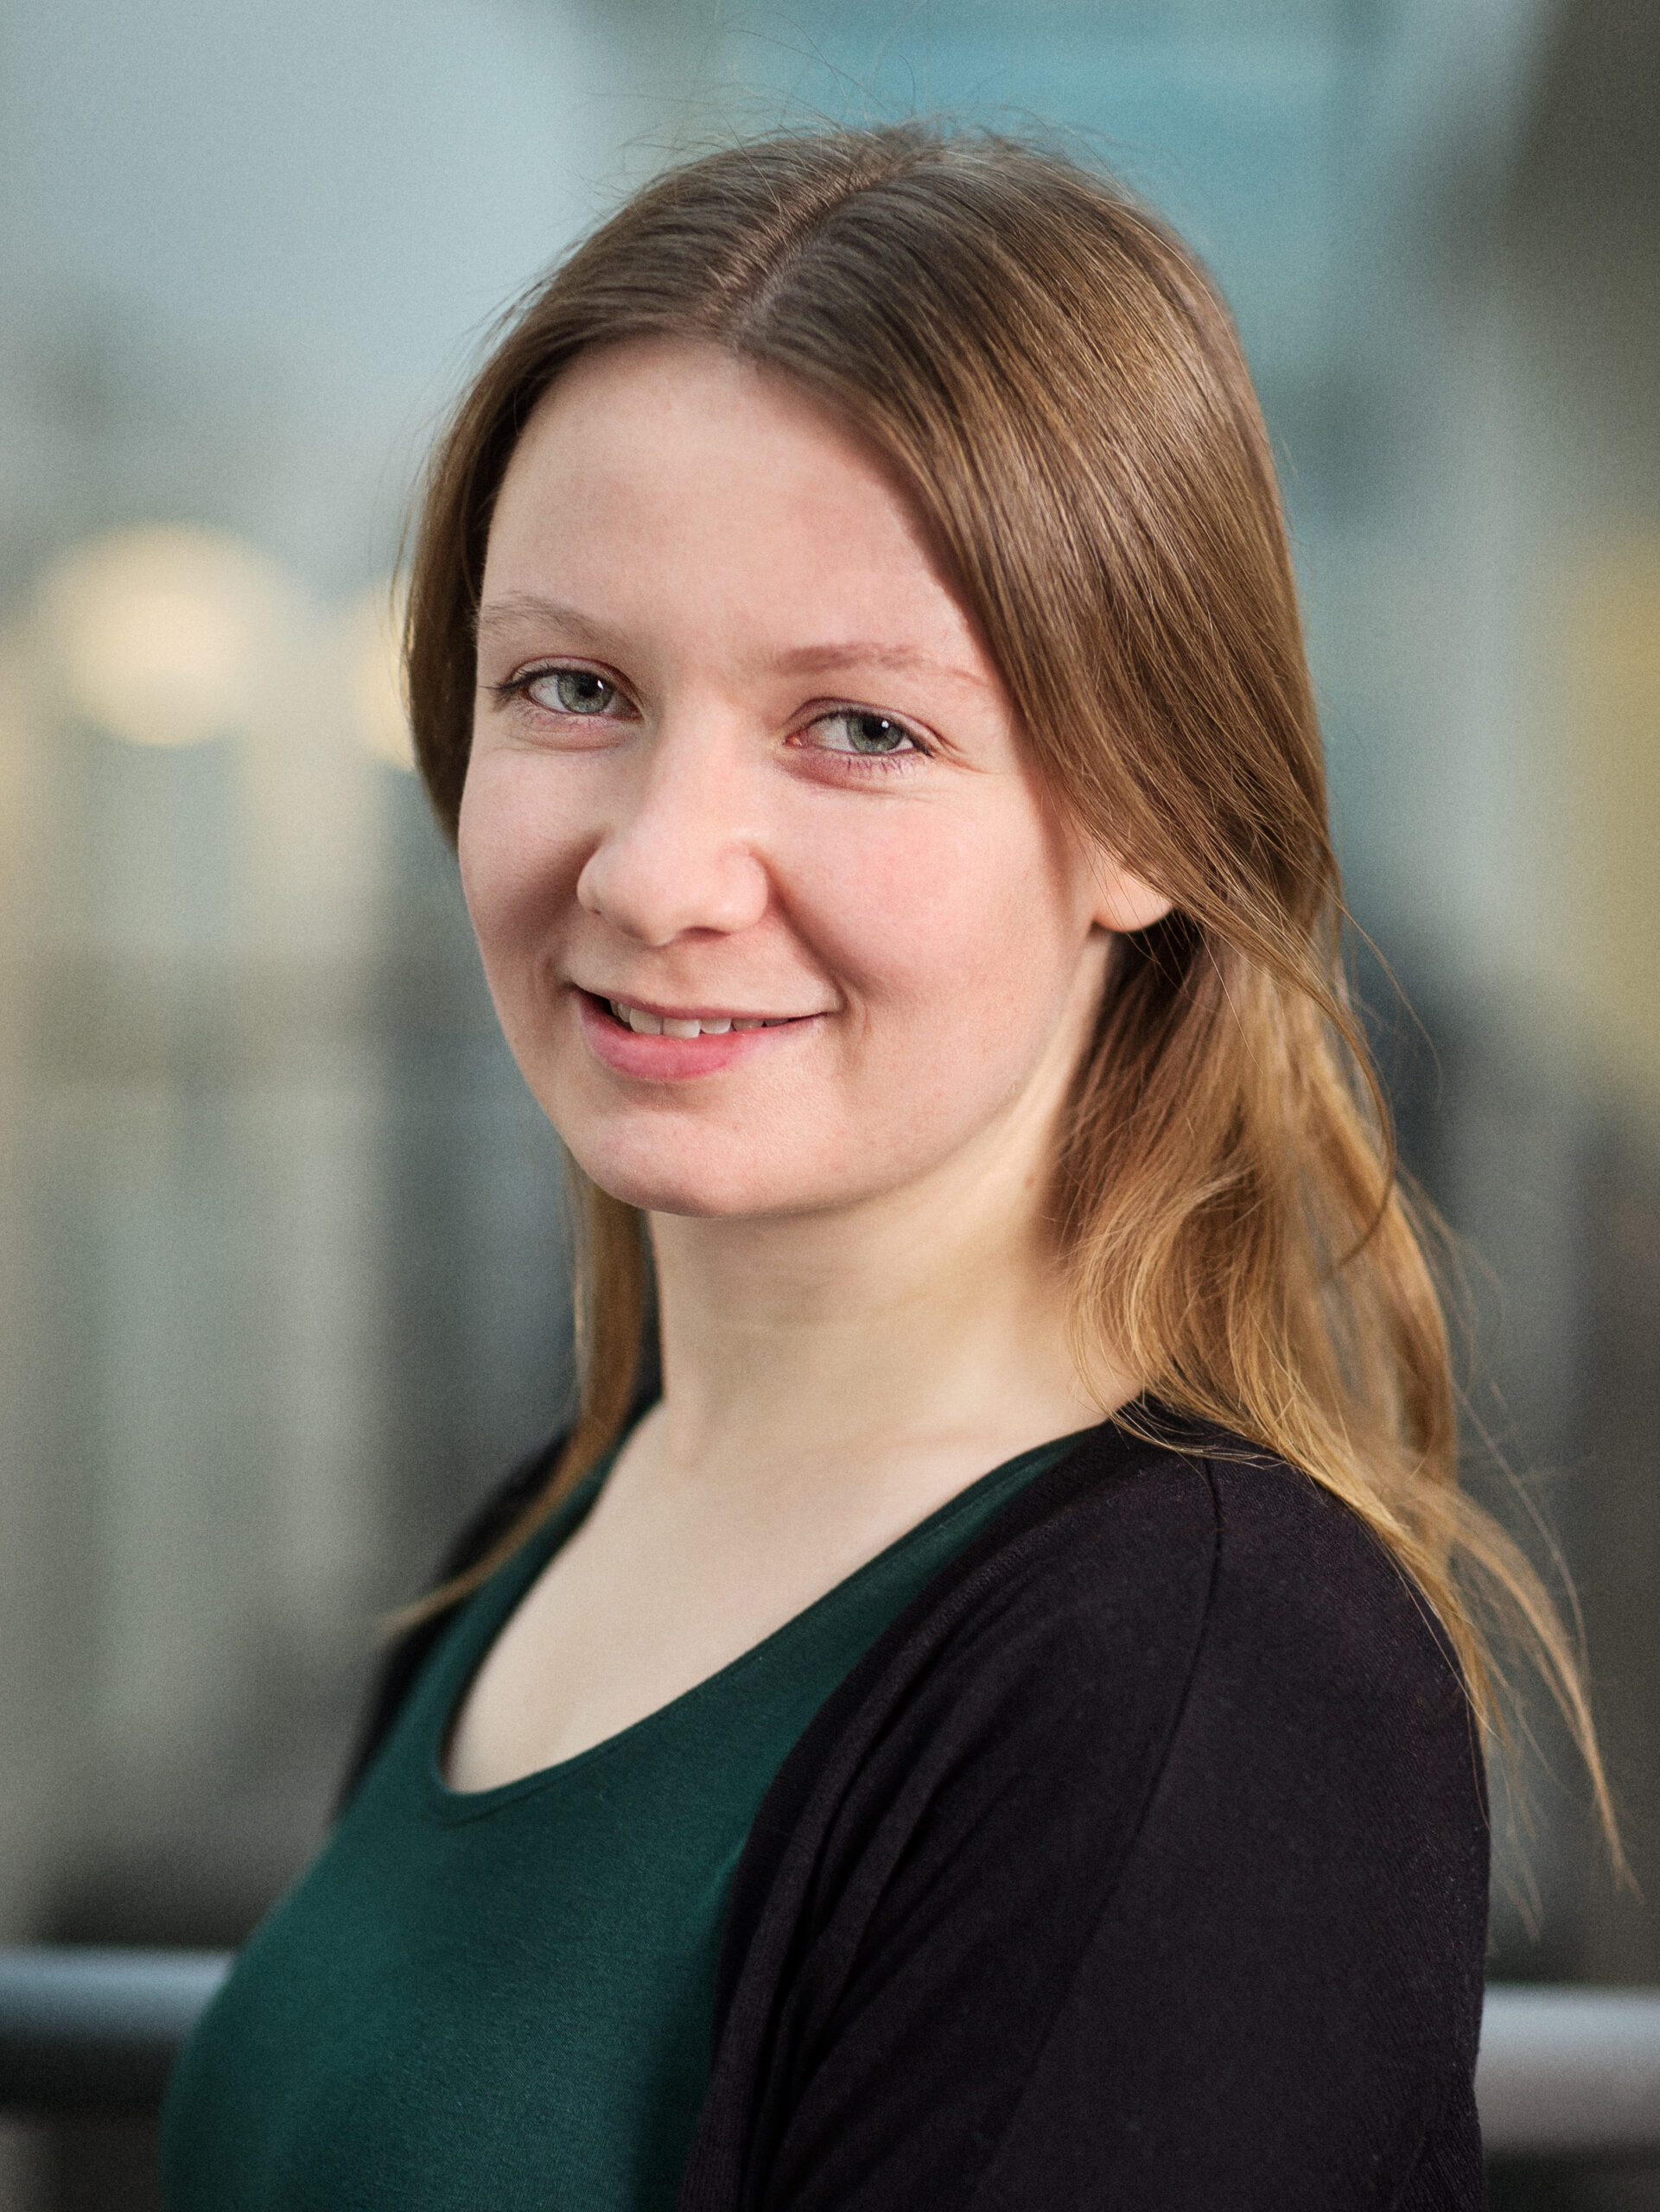 Tanja Domeyer